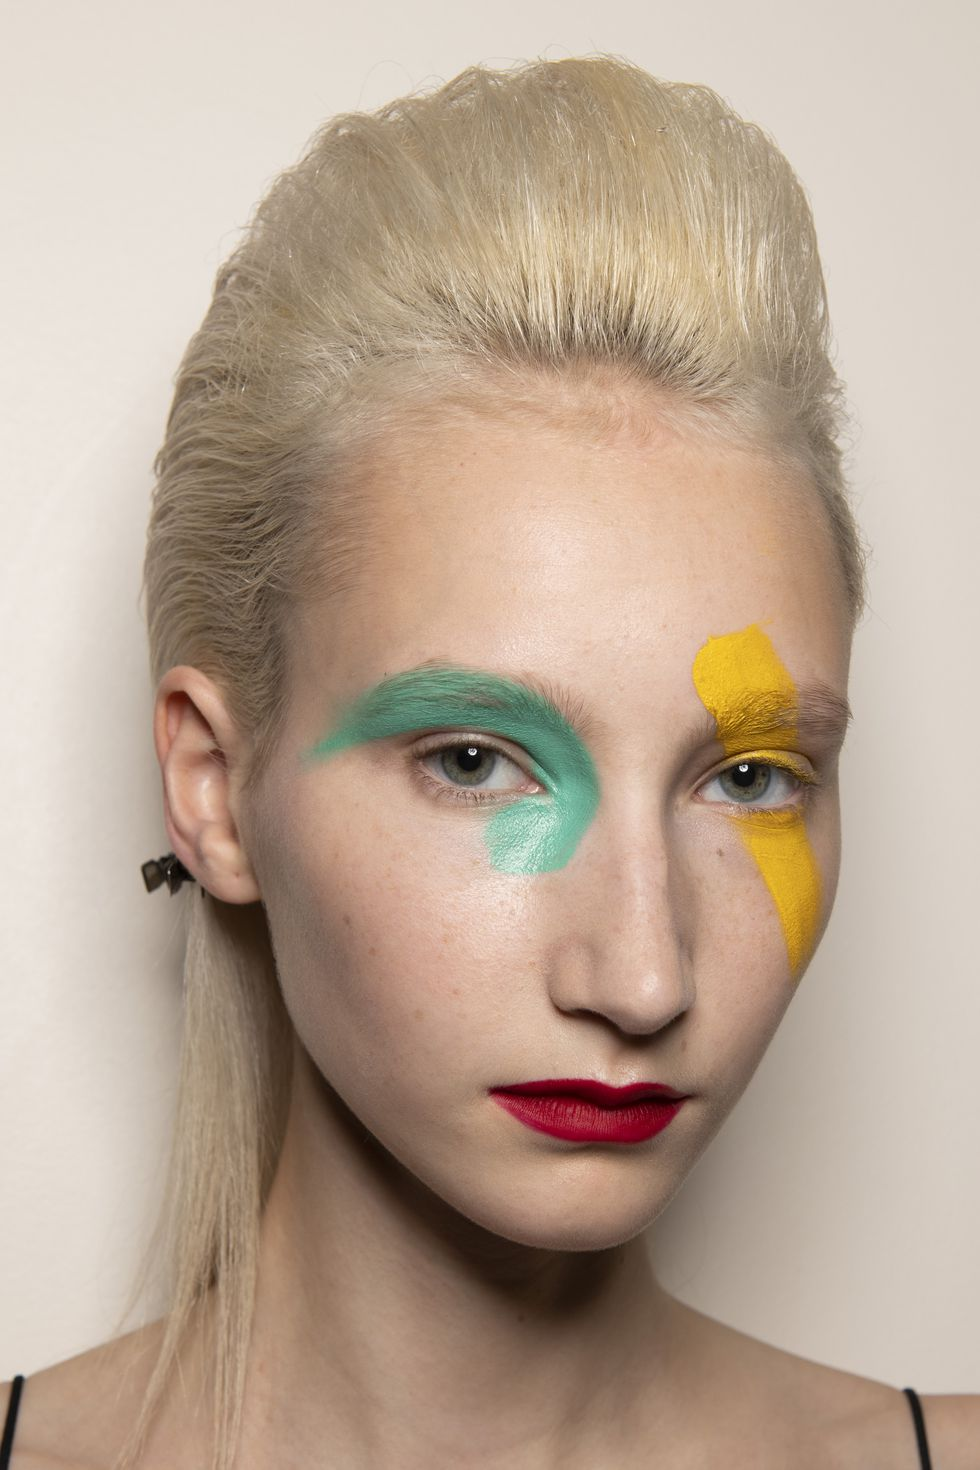 Ronald-Van-Der-Kemp-Paris-avant-garde-Fashion-Red-lips-Style-Rave